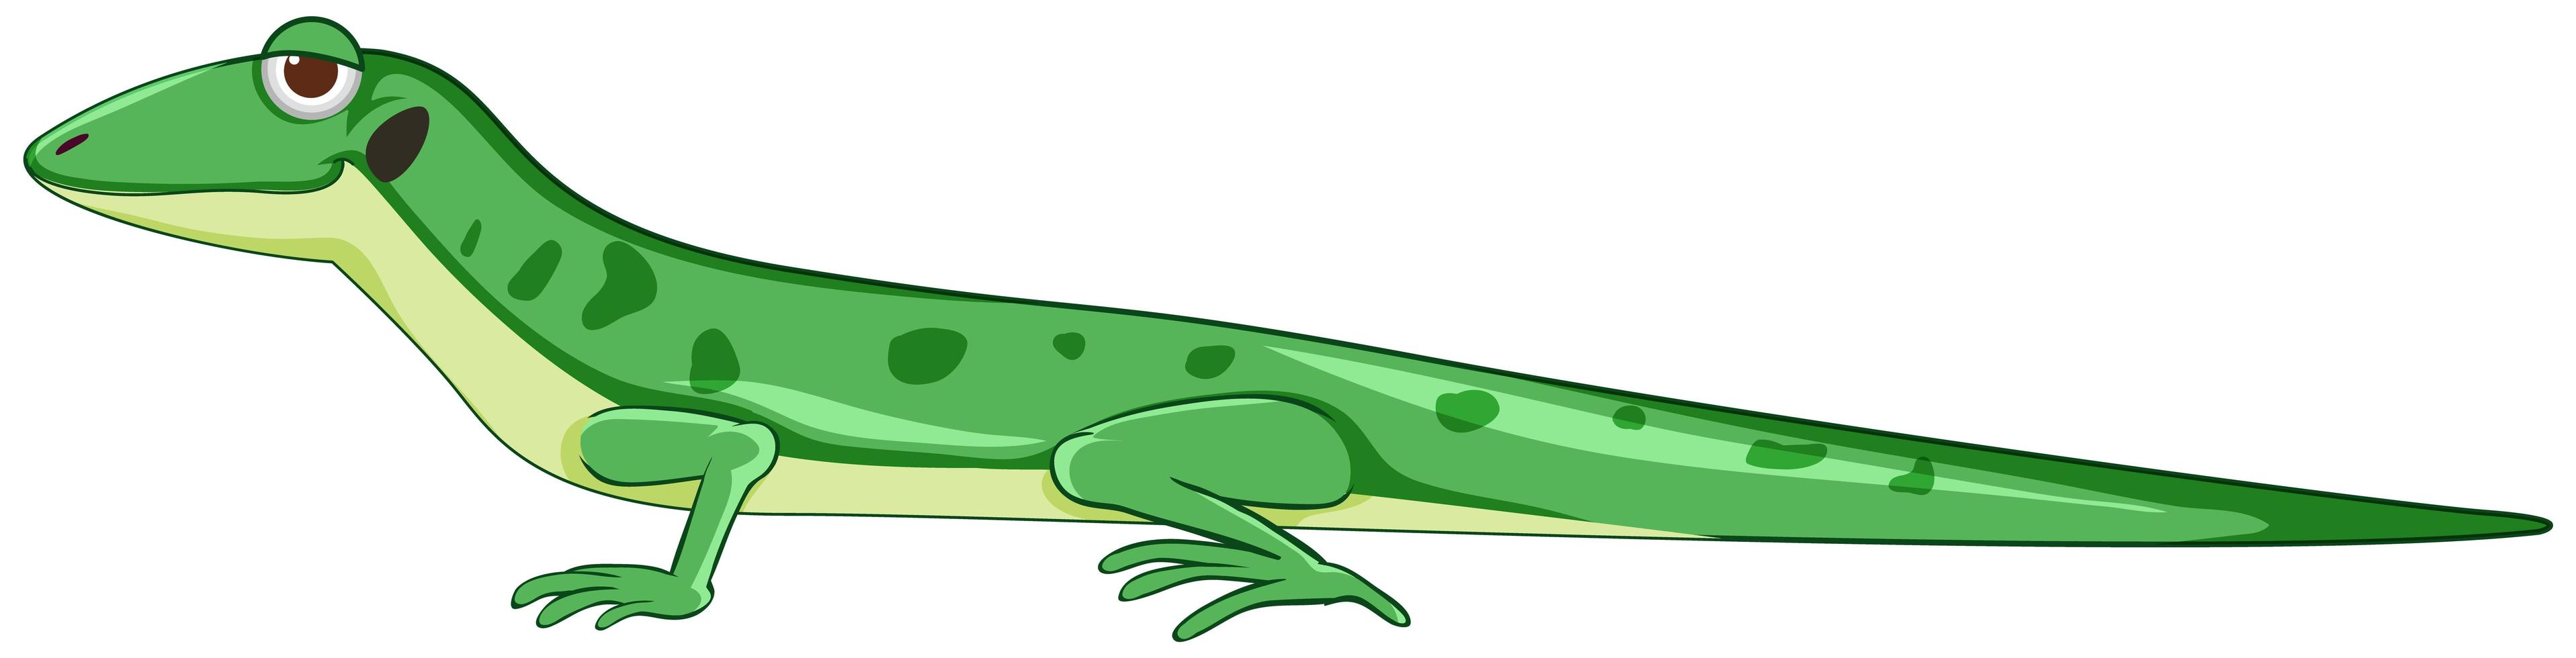 gecko ou lézard de style dessin animé vecteur